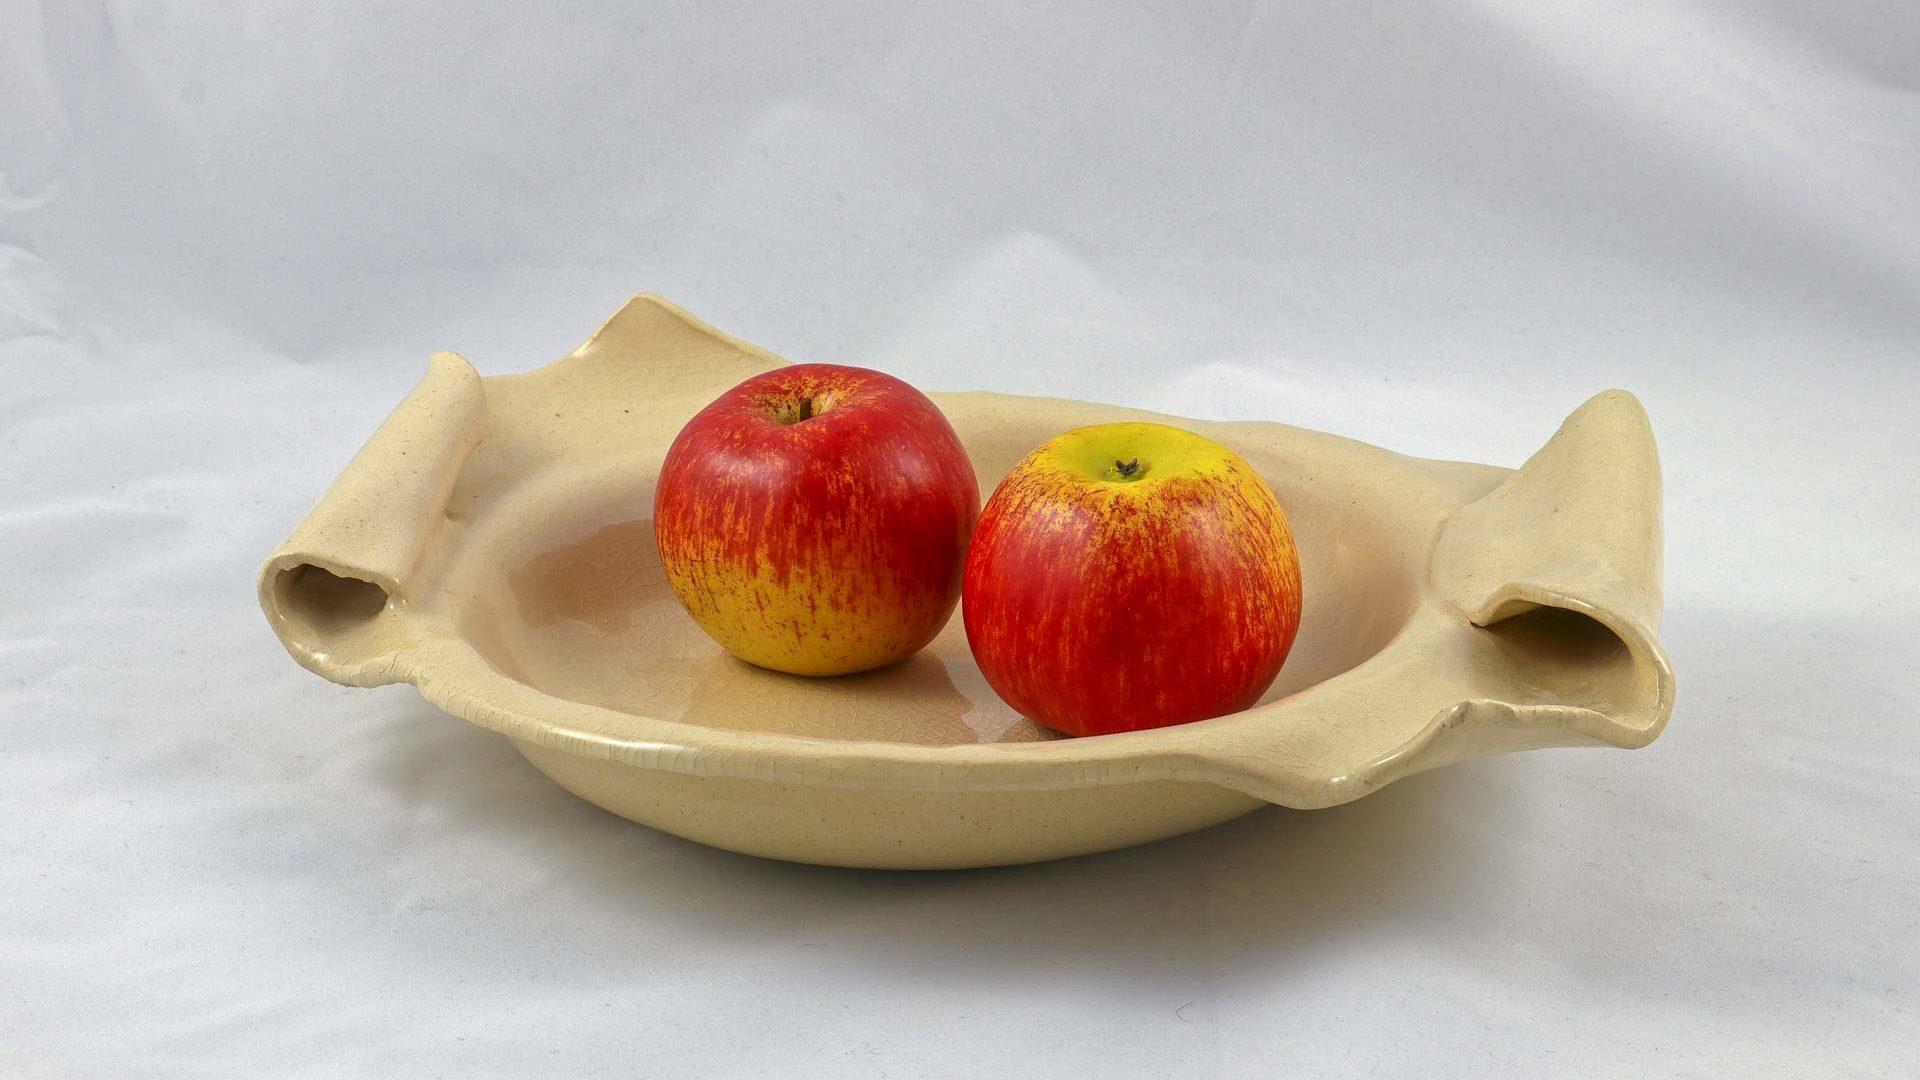 Petra Zobl Keramik - Obst Schale groß transparent craquele